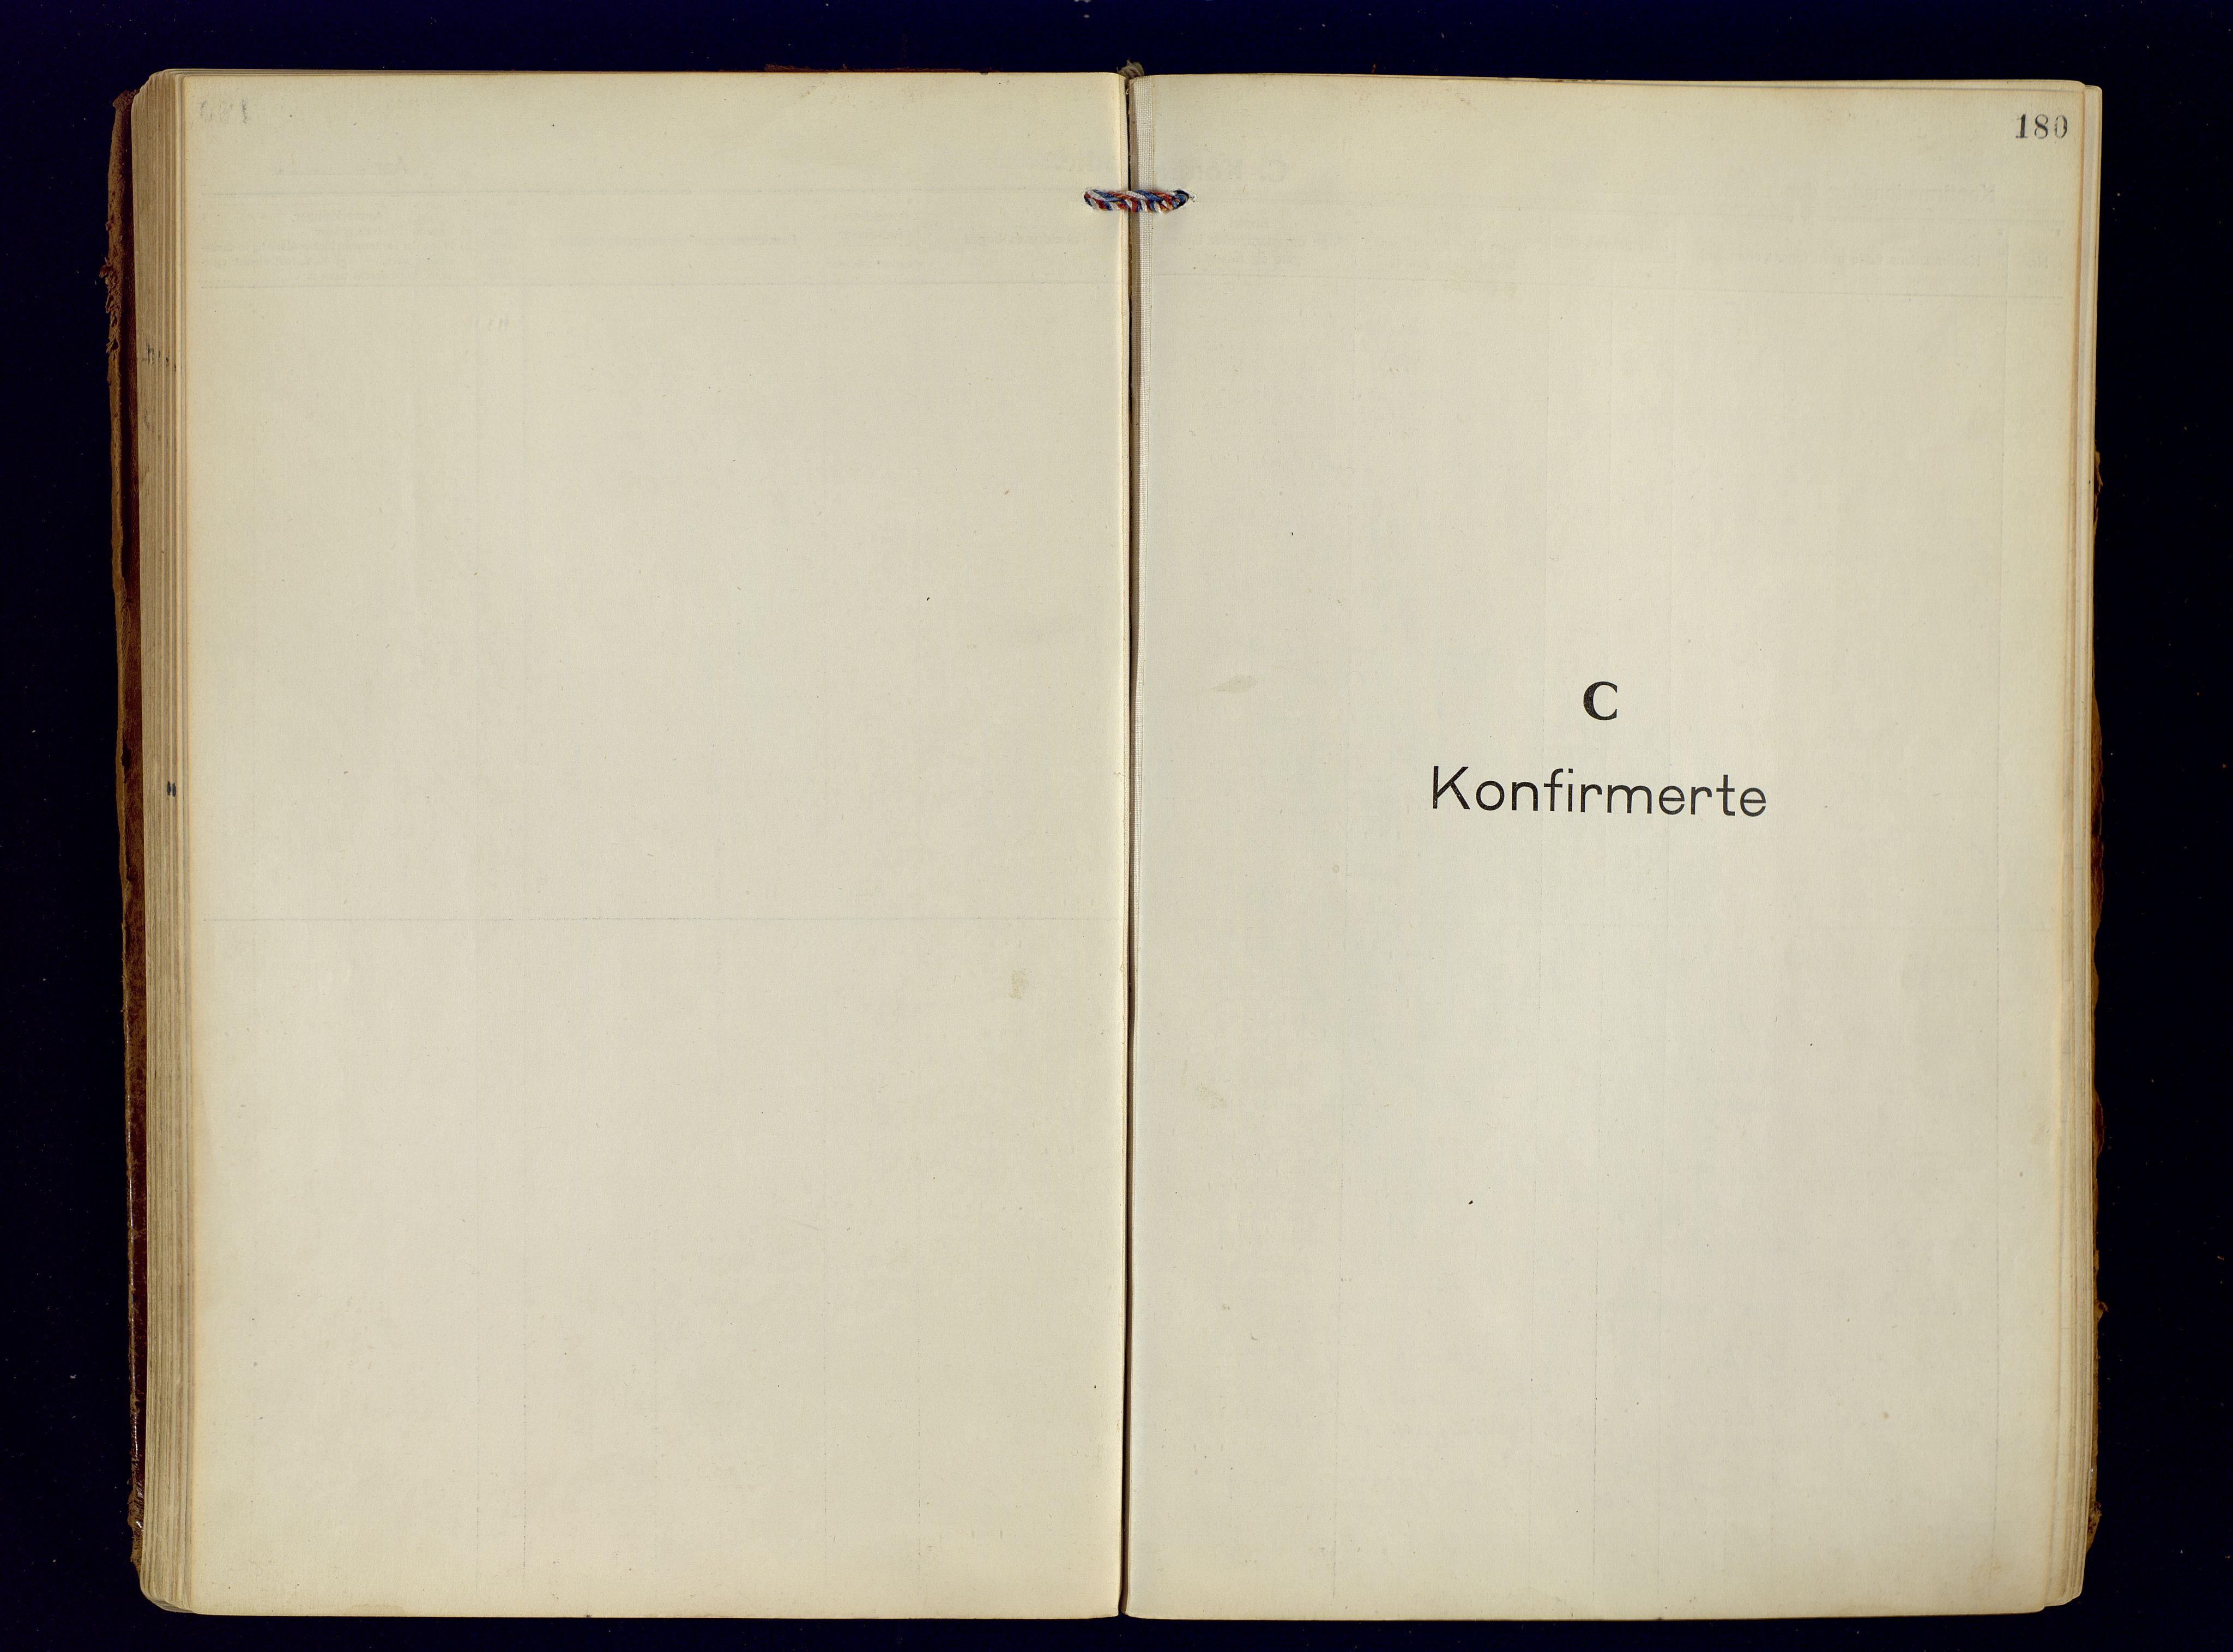 SATØ, Tromsøysund sokneprestkontor, G/Ga: Ministerialbok nr. 9, 1922-1934, s. 180